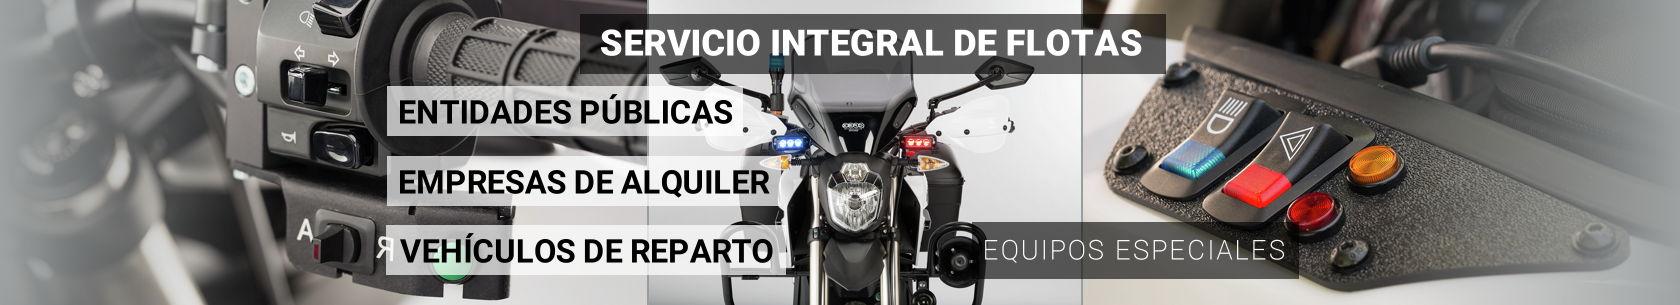 XR-MOTOS-Servicio-integral-de-flotas